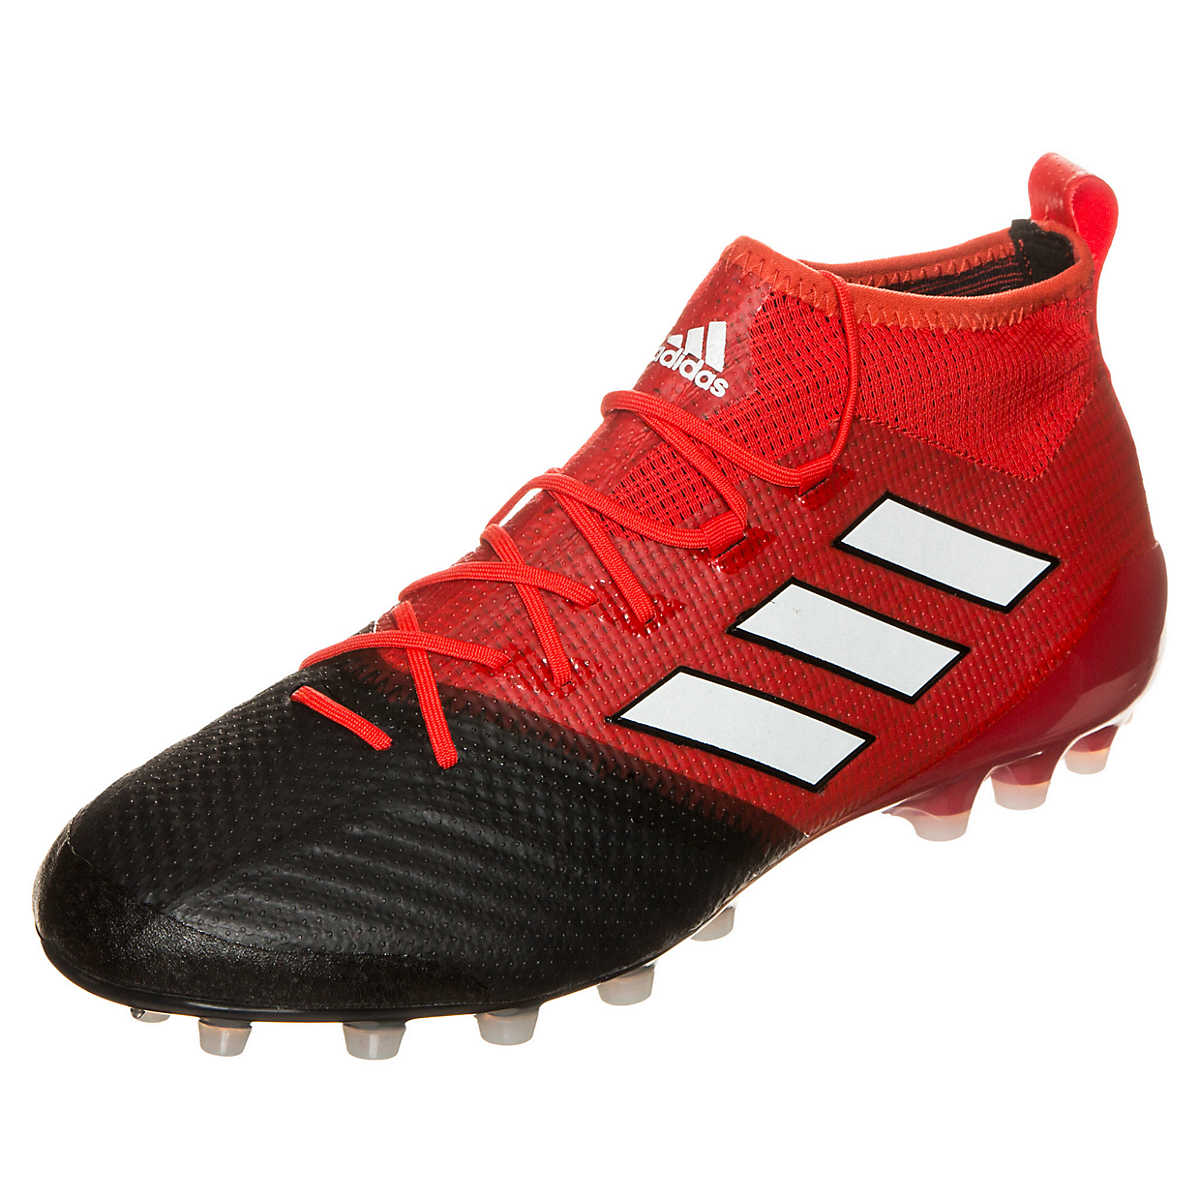 adidas ACE 17.1 Primeknit AG FuÃ?Â?ballschuh rot-kombi - adidas Performance - Sportschuhe - Schuhe - mirapodo.de